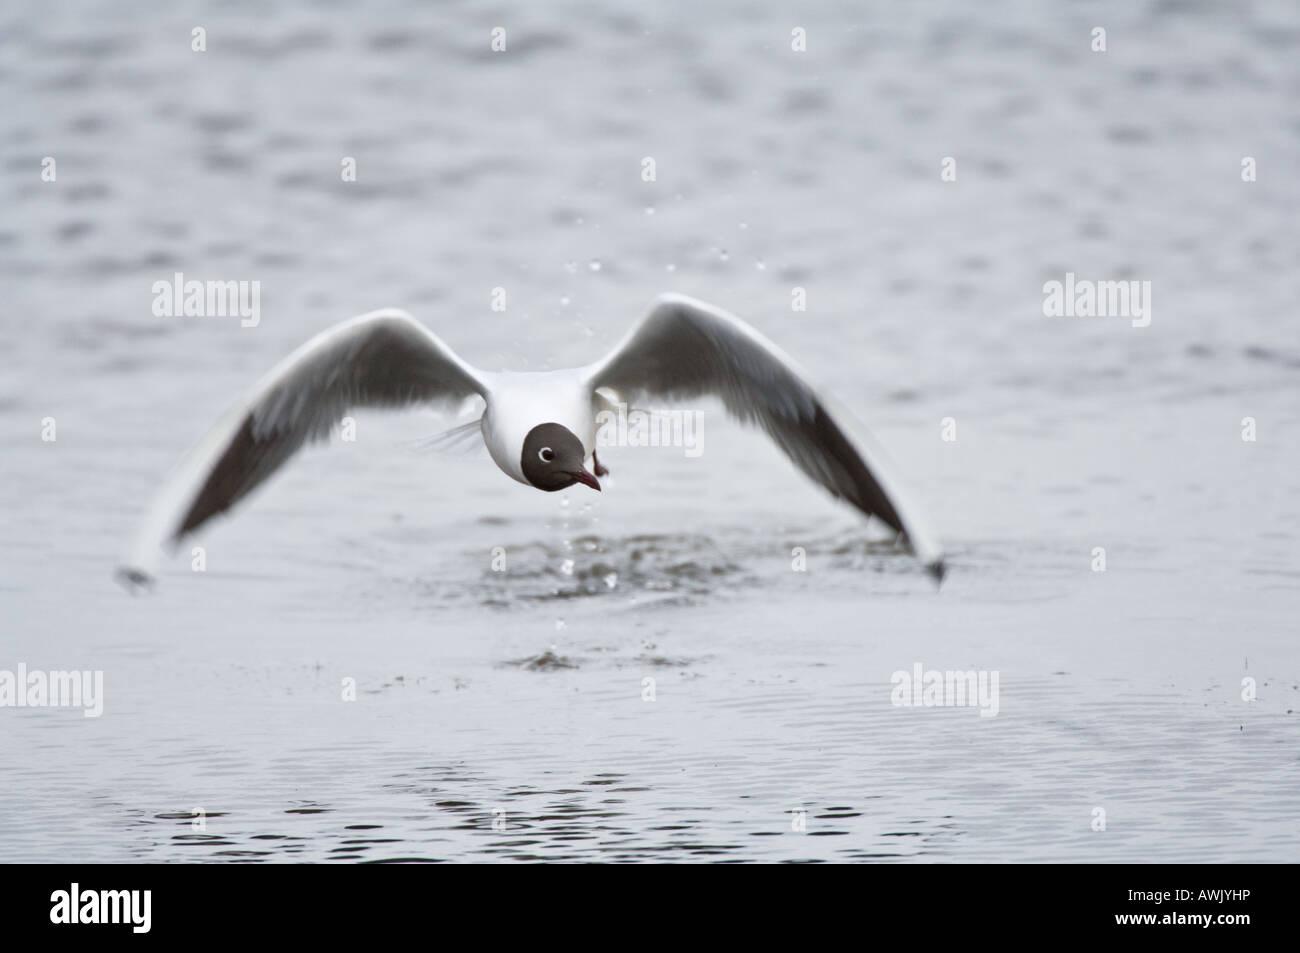 Black headed Gull Larus ridibundus adult on water Titchwell Norfolk East Anglia England March Stock Photo